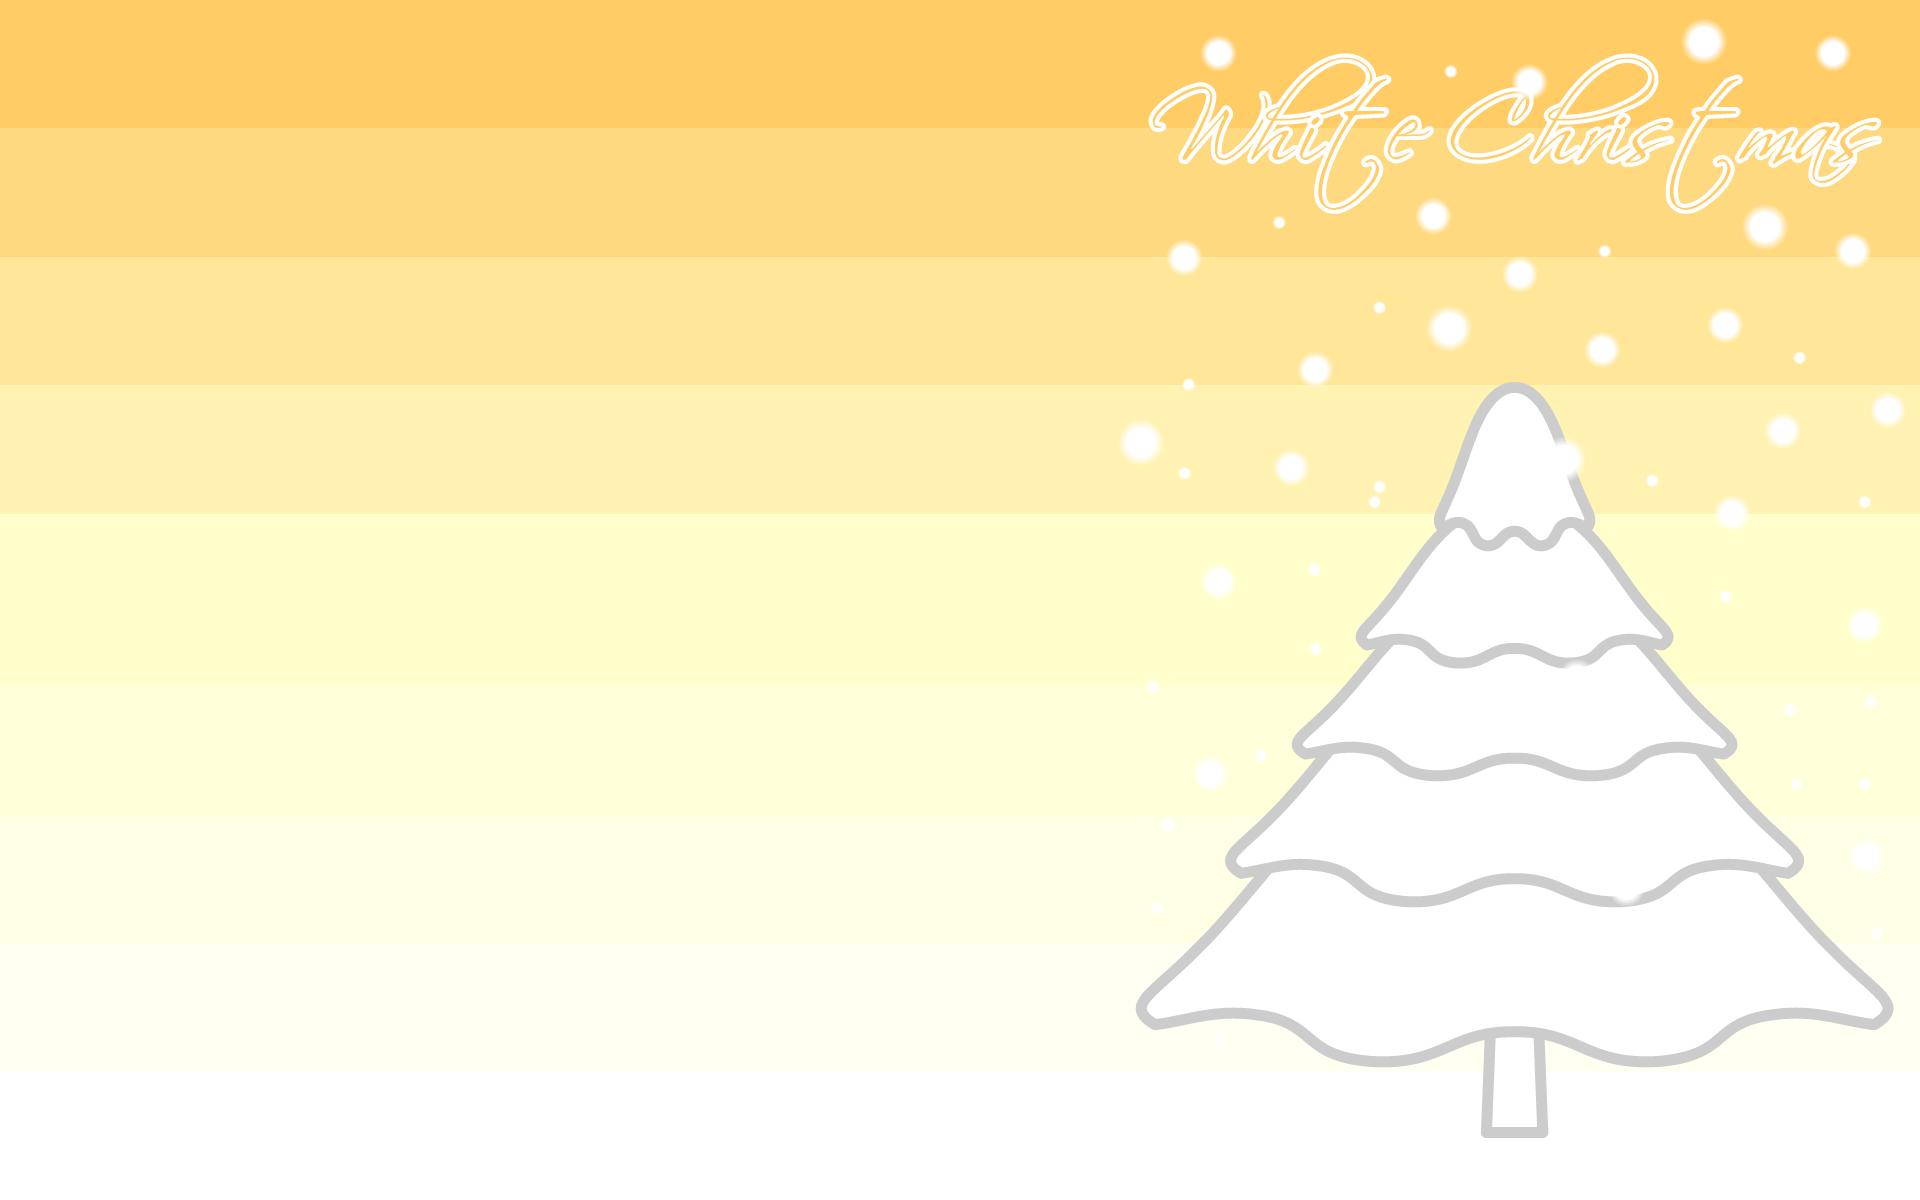 wallpaper6_christmas-white-gold-pc